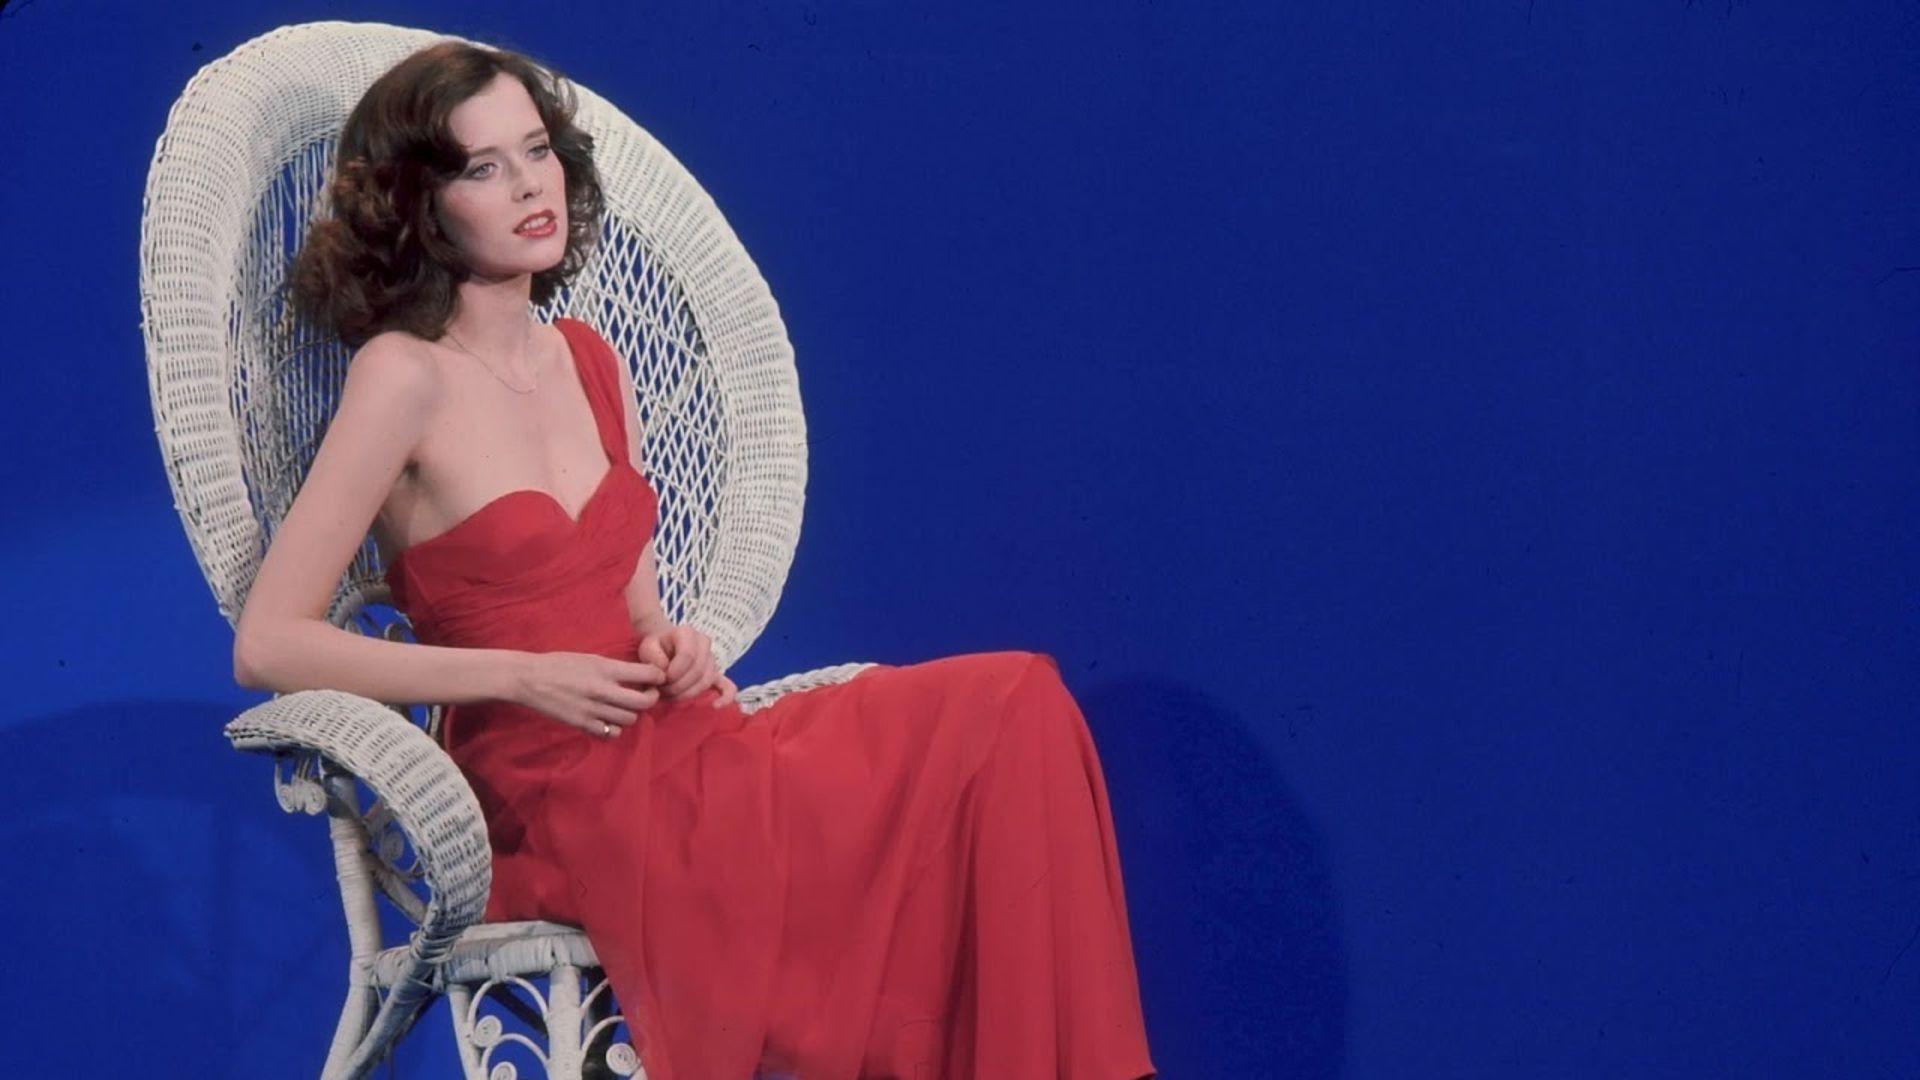 Erotizmin sembolü: Sylvia Kristel! Son dakika magazin haberleri